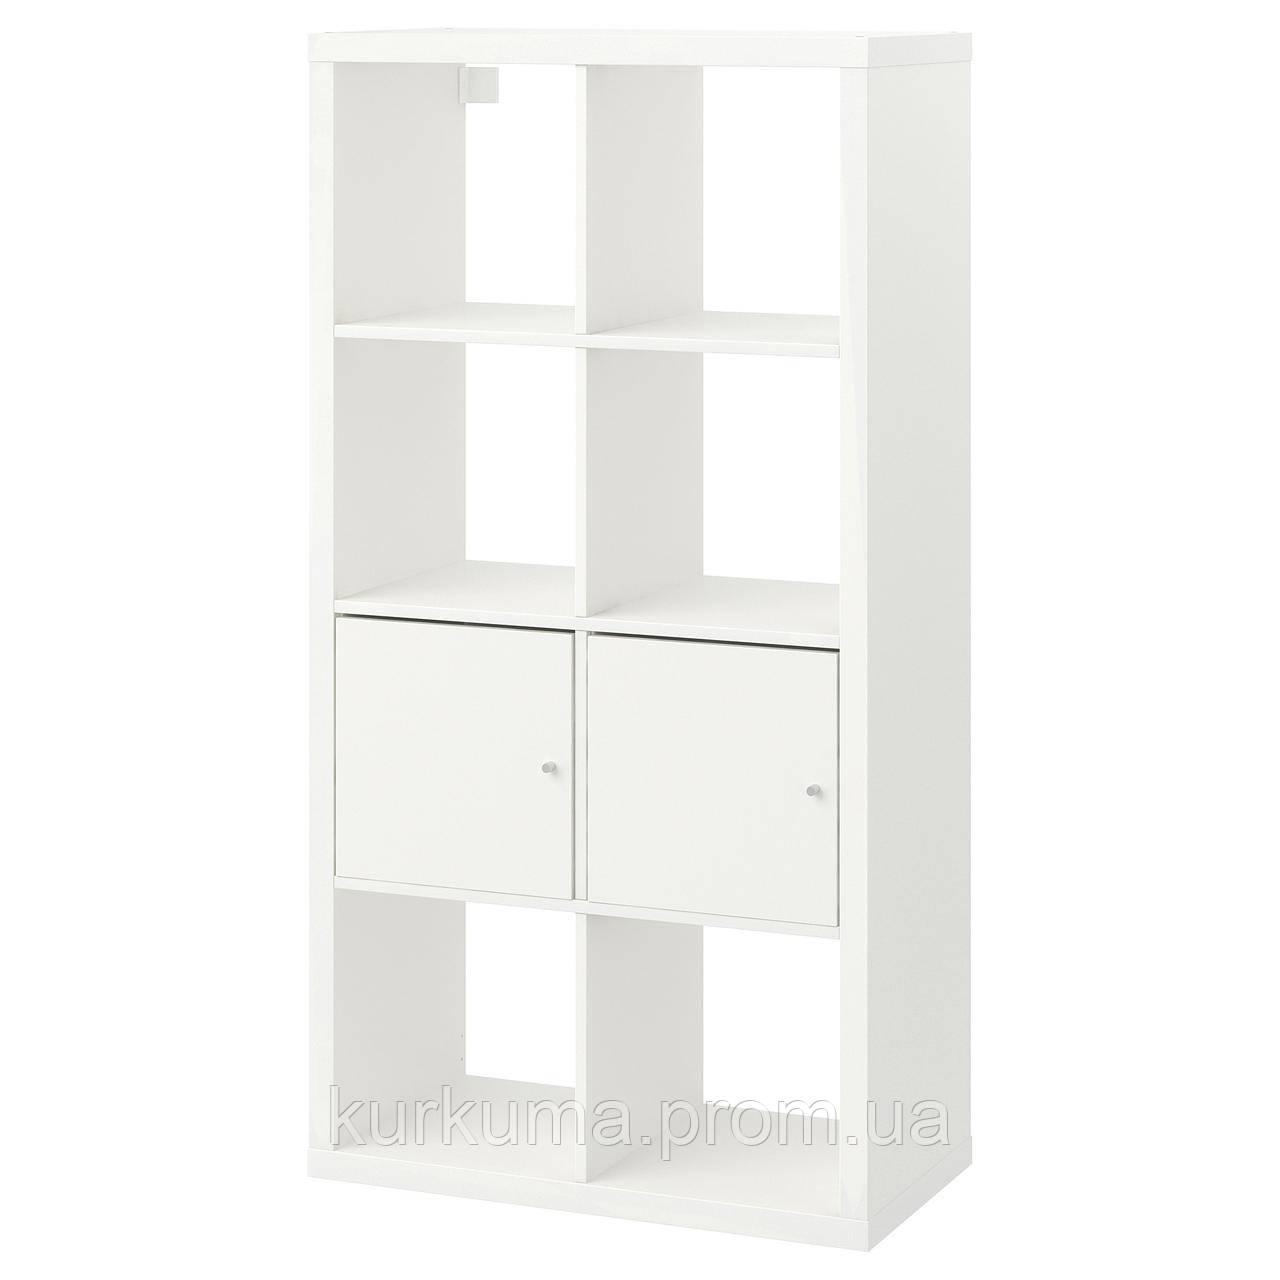 IKEA KALLAX Стеллаж с дверями, белый  (990.171.86)